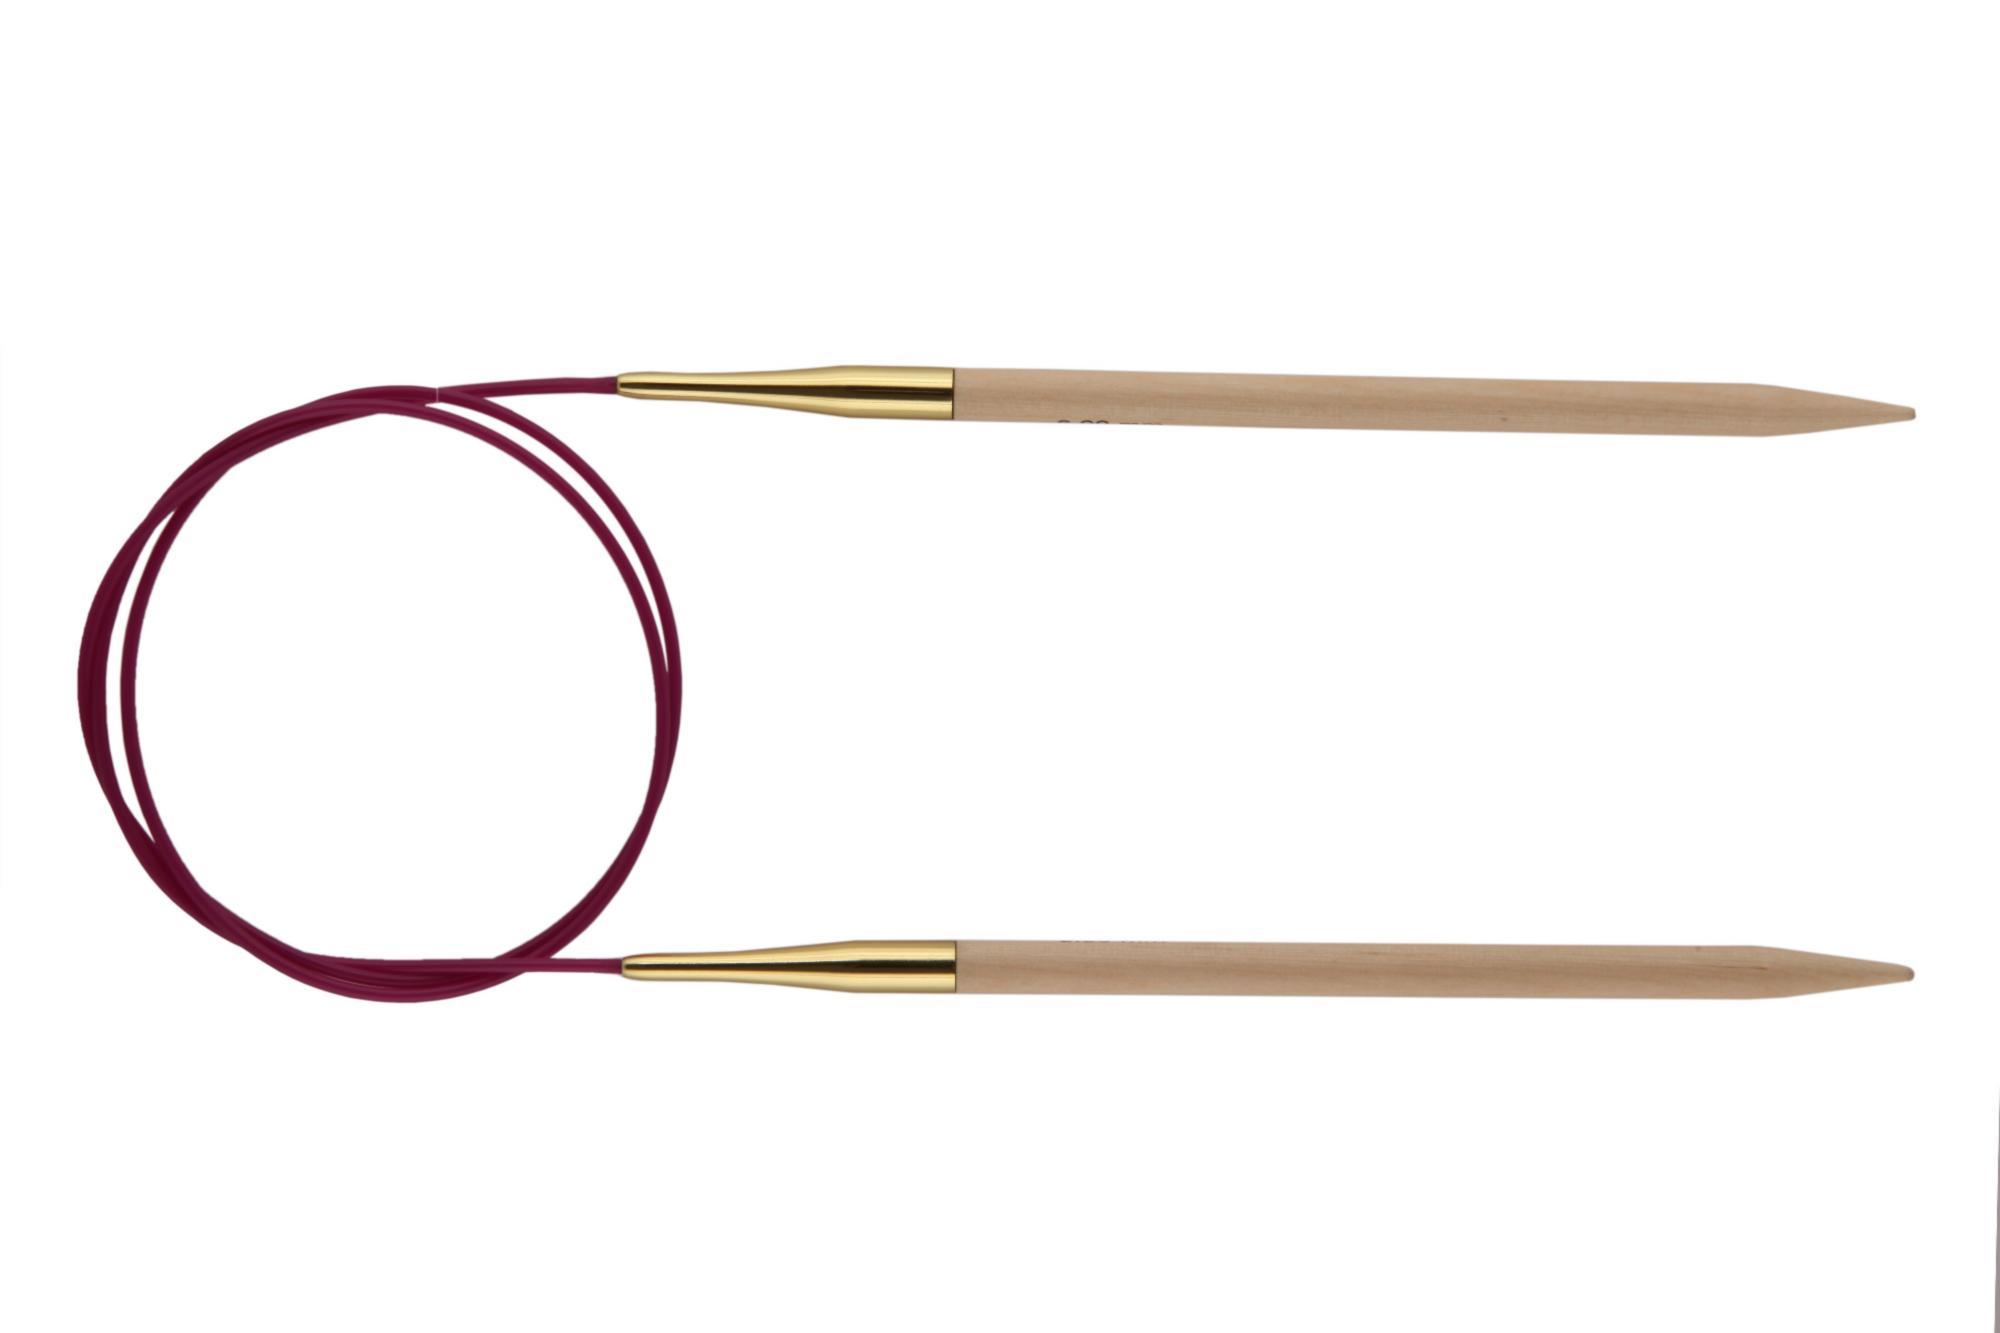 Спицы круговые 120 см Basix Birch Wood KnitPro, 35351, 5.50 мм